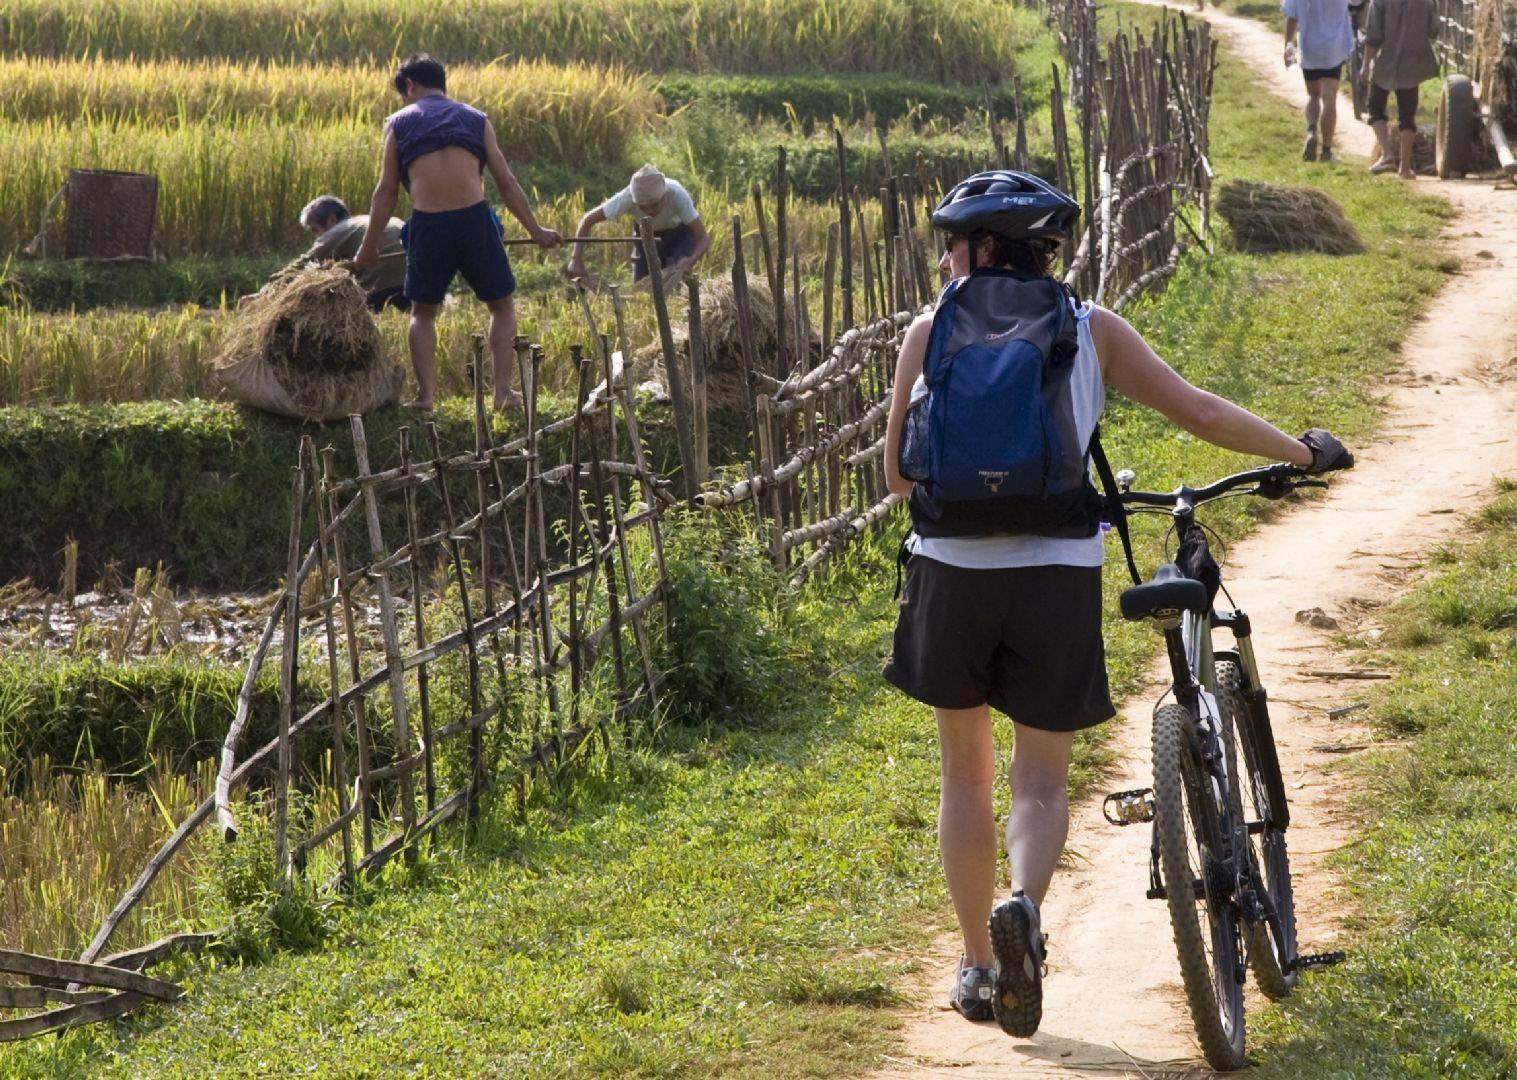 Nam '09-4.jpg - Laos - Hidden Treasures - Cycling Adventures